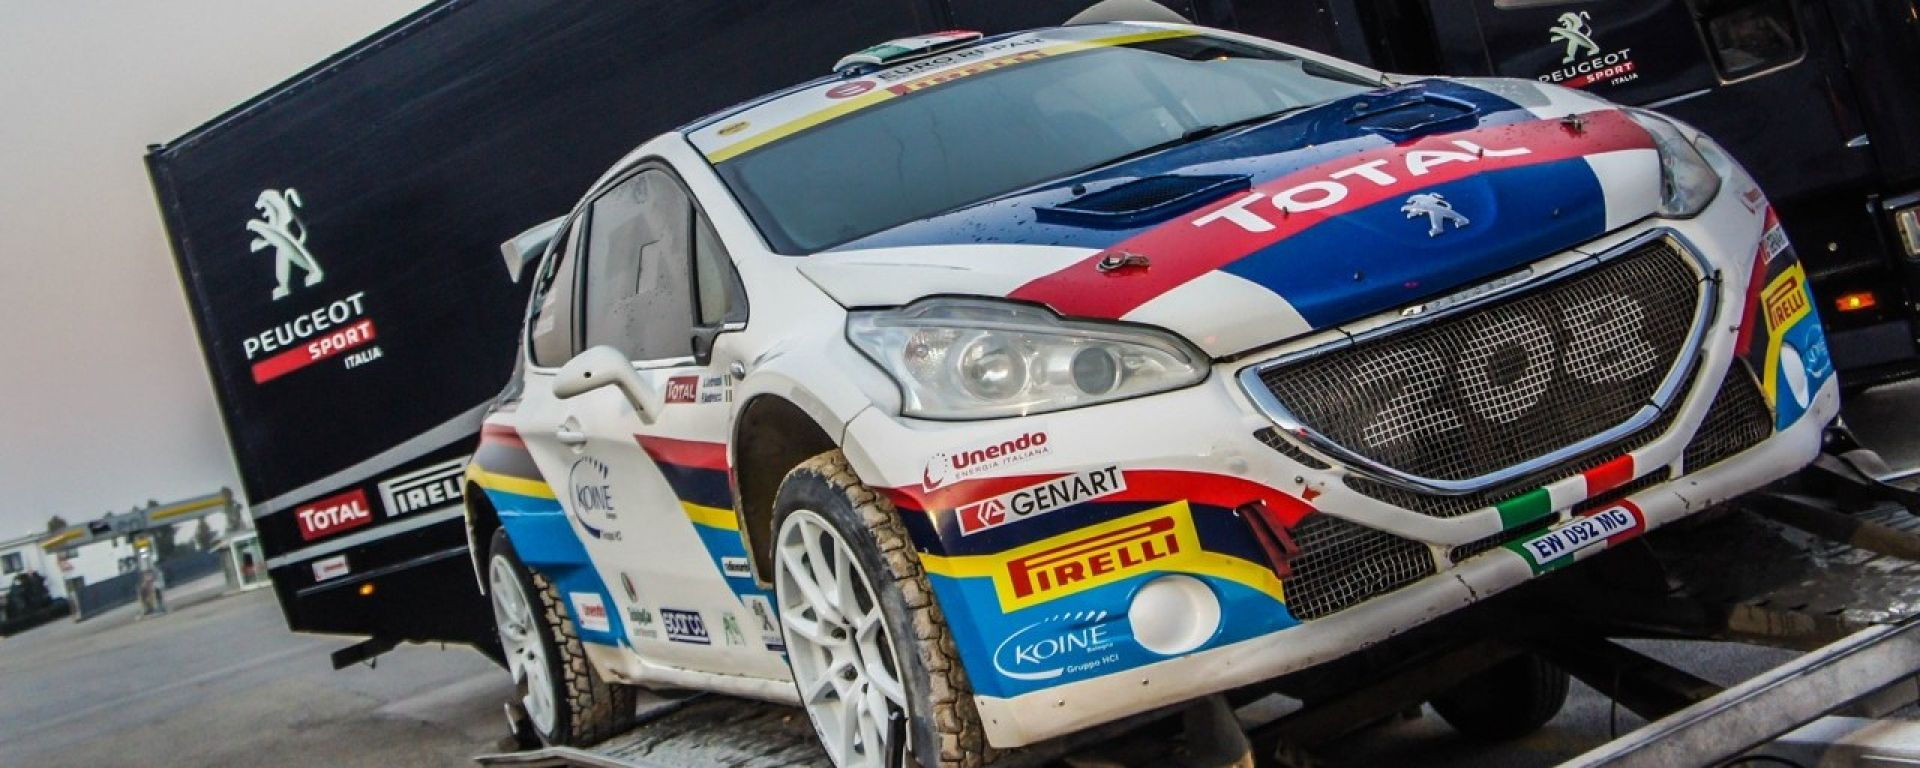 Peugeot Sport Italia - Peugeot 208 T16